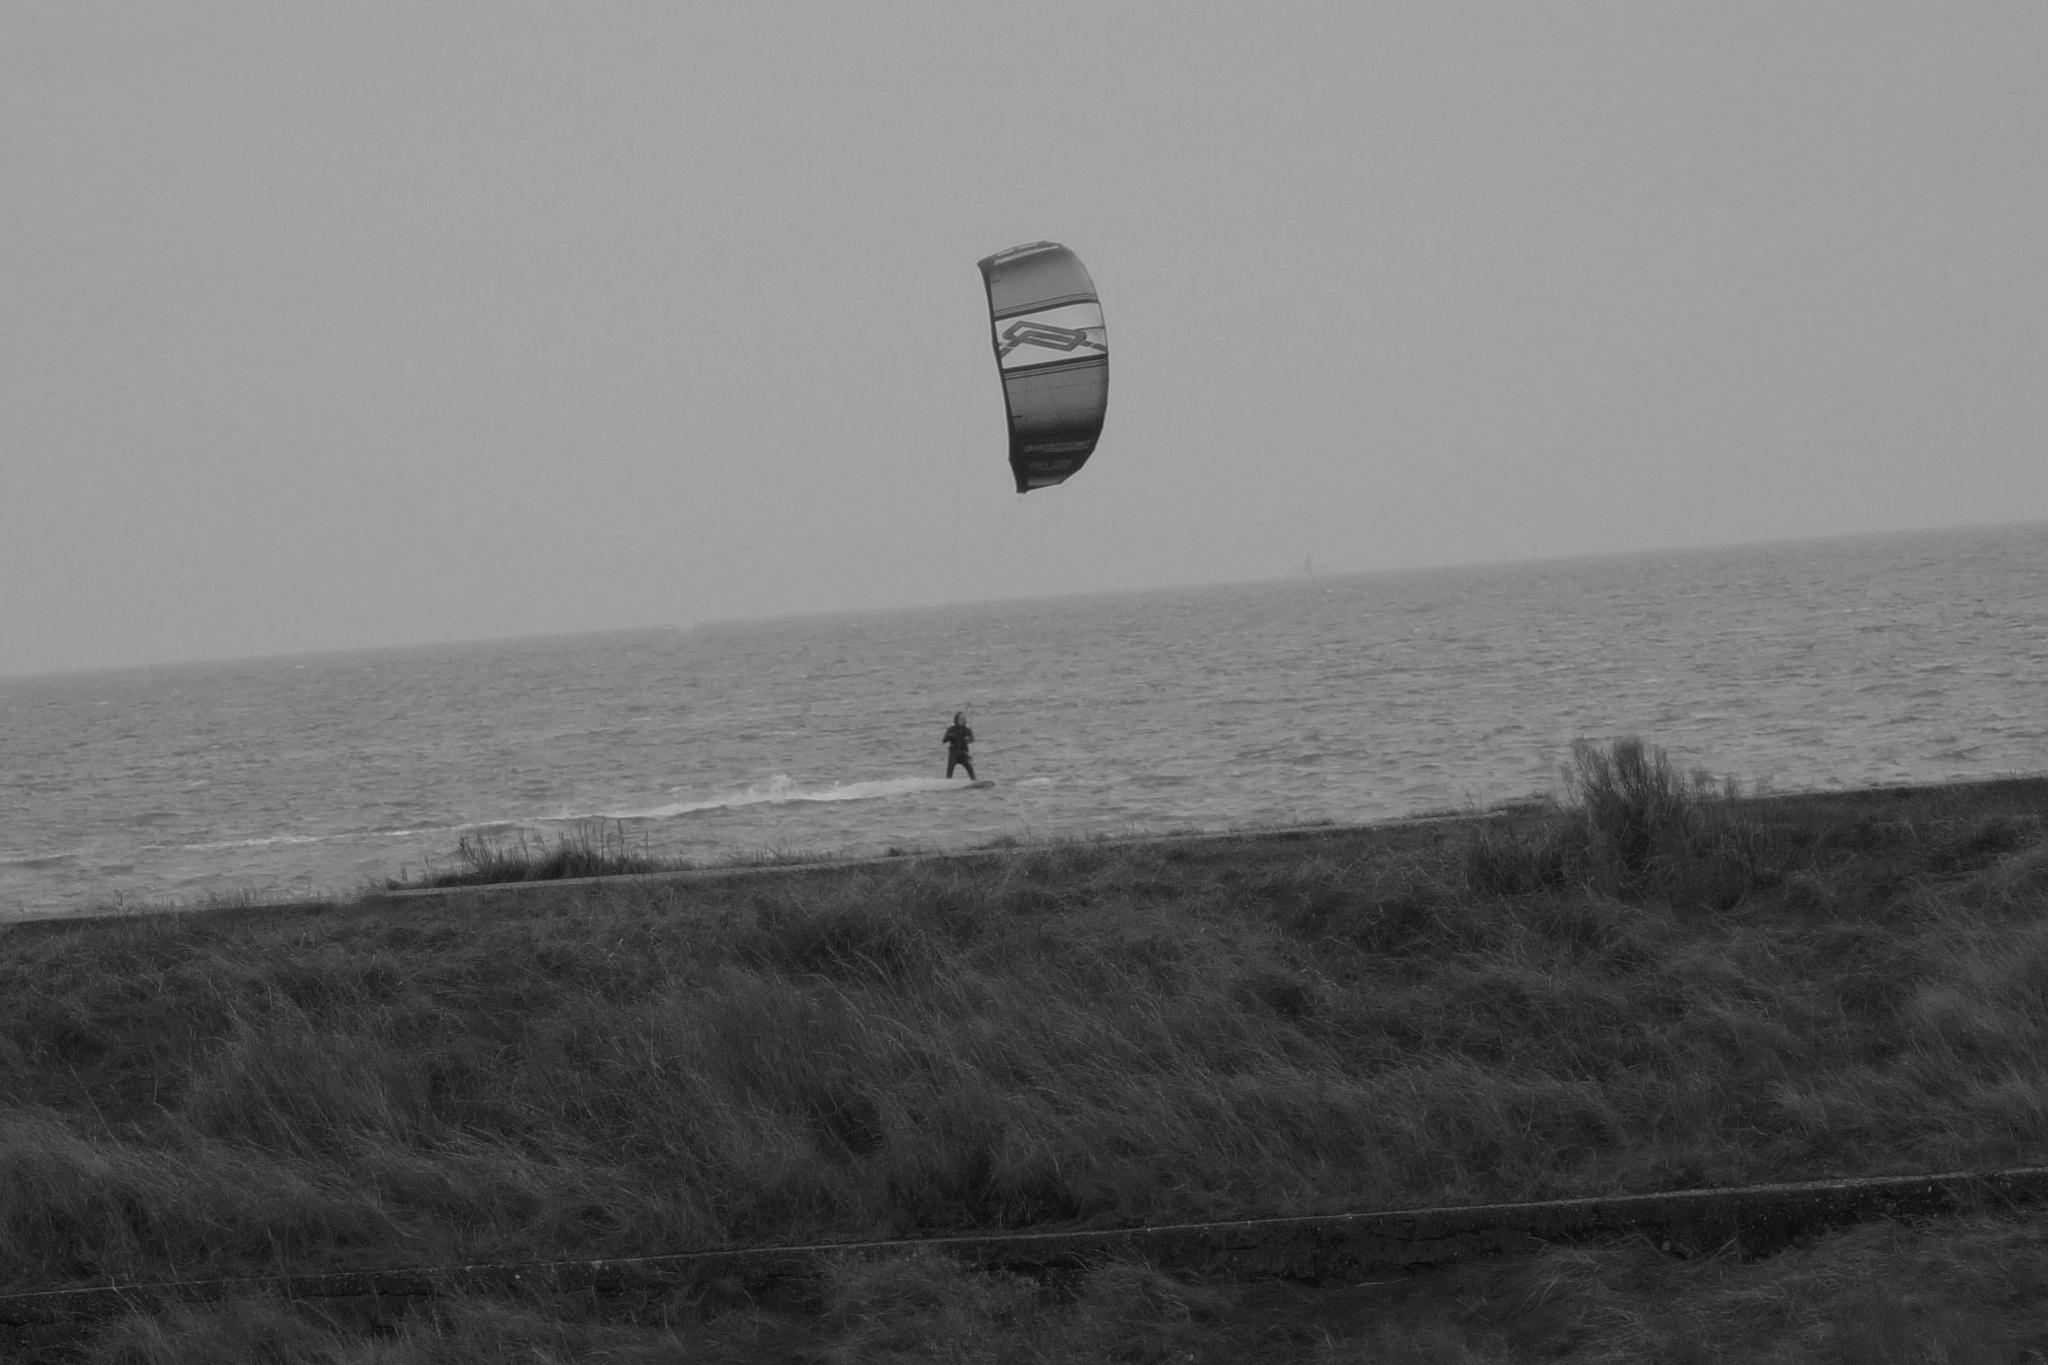 High speed Kitesurfing on Waddensea by Roelof de Haan